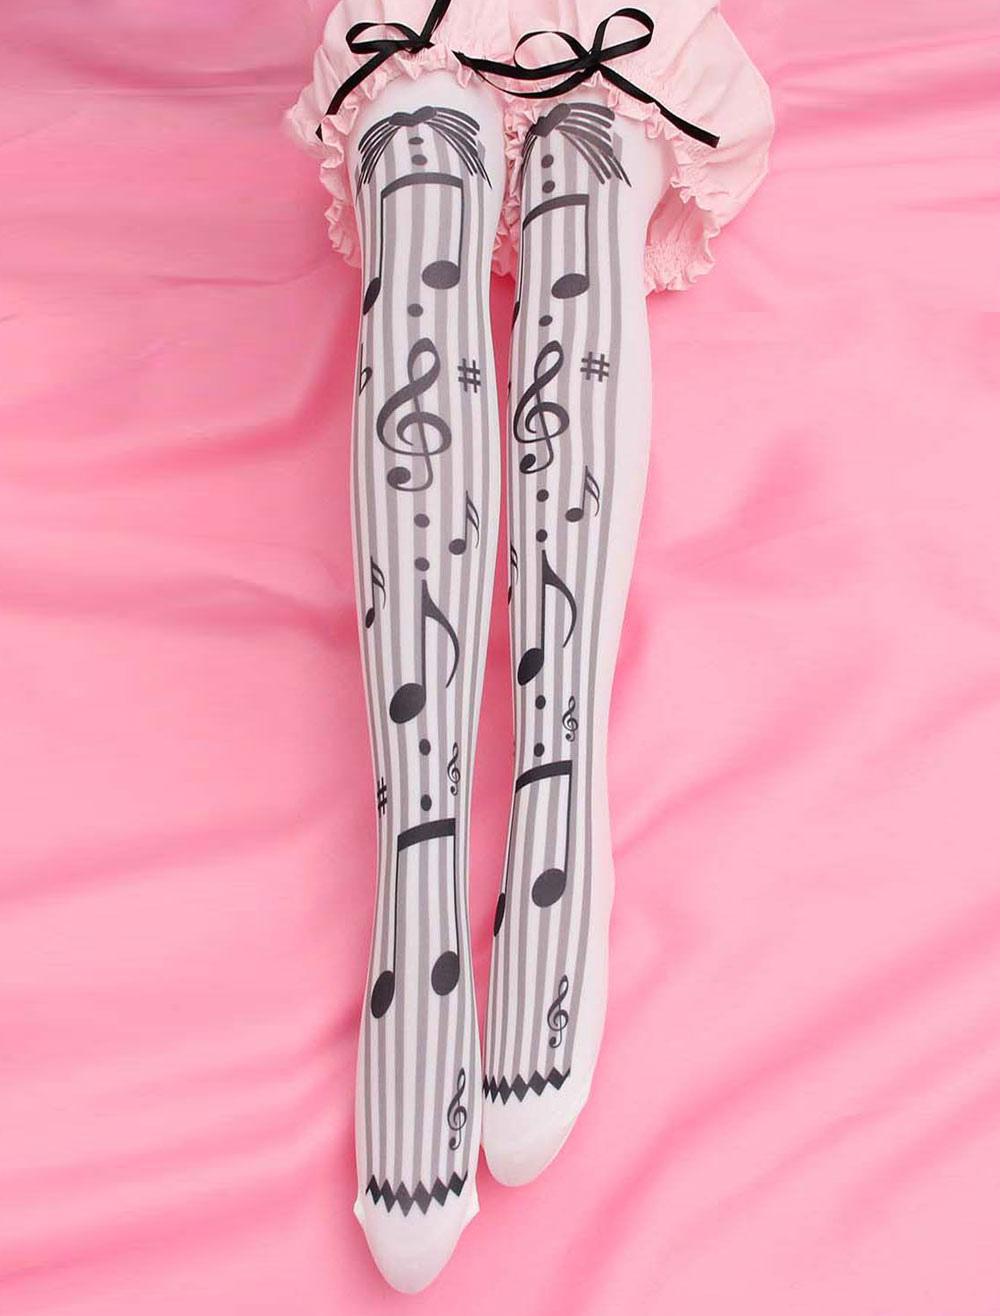 Buy Sweet Lolita Socks Black Music Note Printed Lolita Stocking for $4.99 in Milanoo store